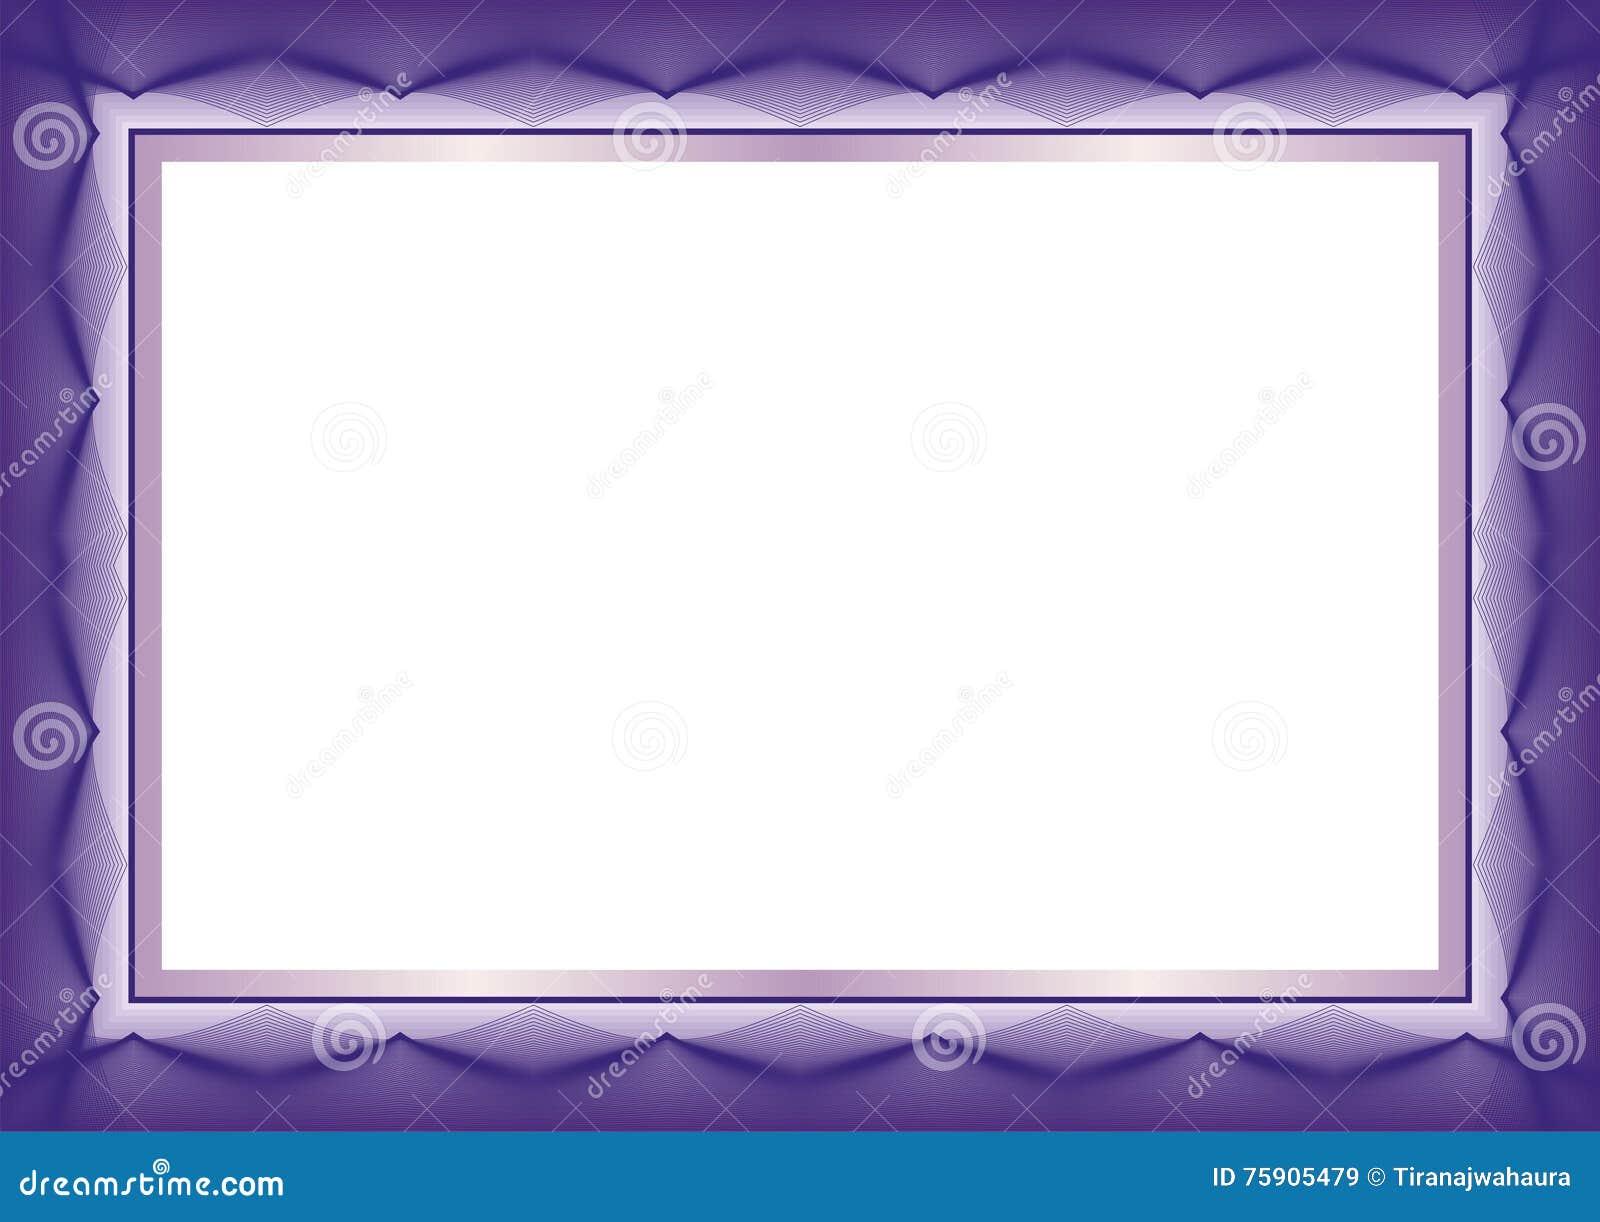 Фиолетовая рамка шаблона сертификата или диплома - граница